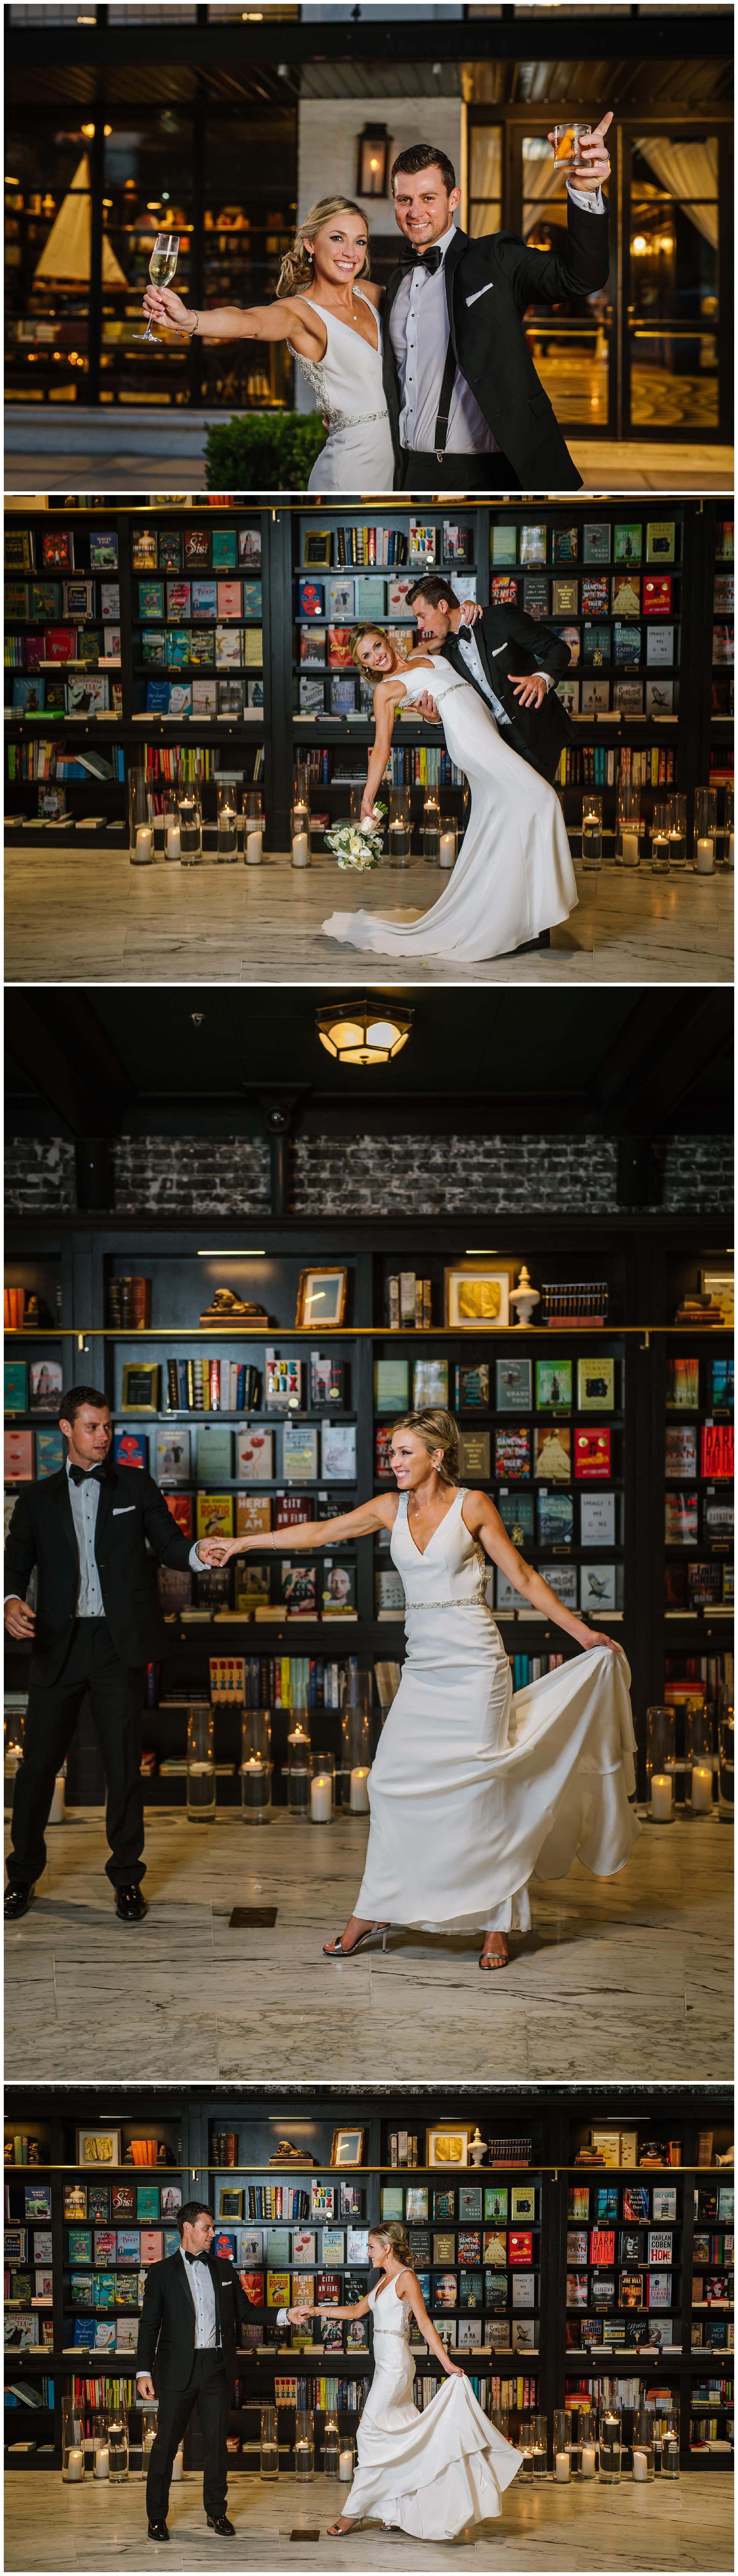 Oxford-exchange-wedding-photogapher-garland-candels-bookstore-burgandy-botanica_0053.jpg